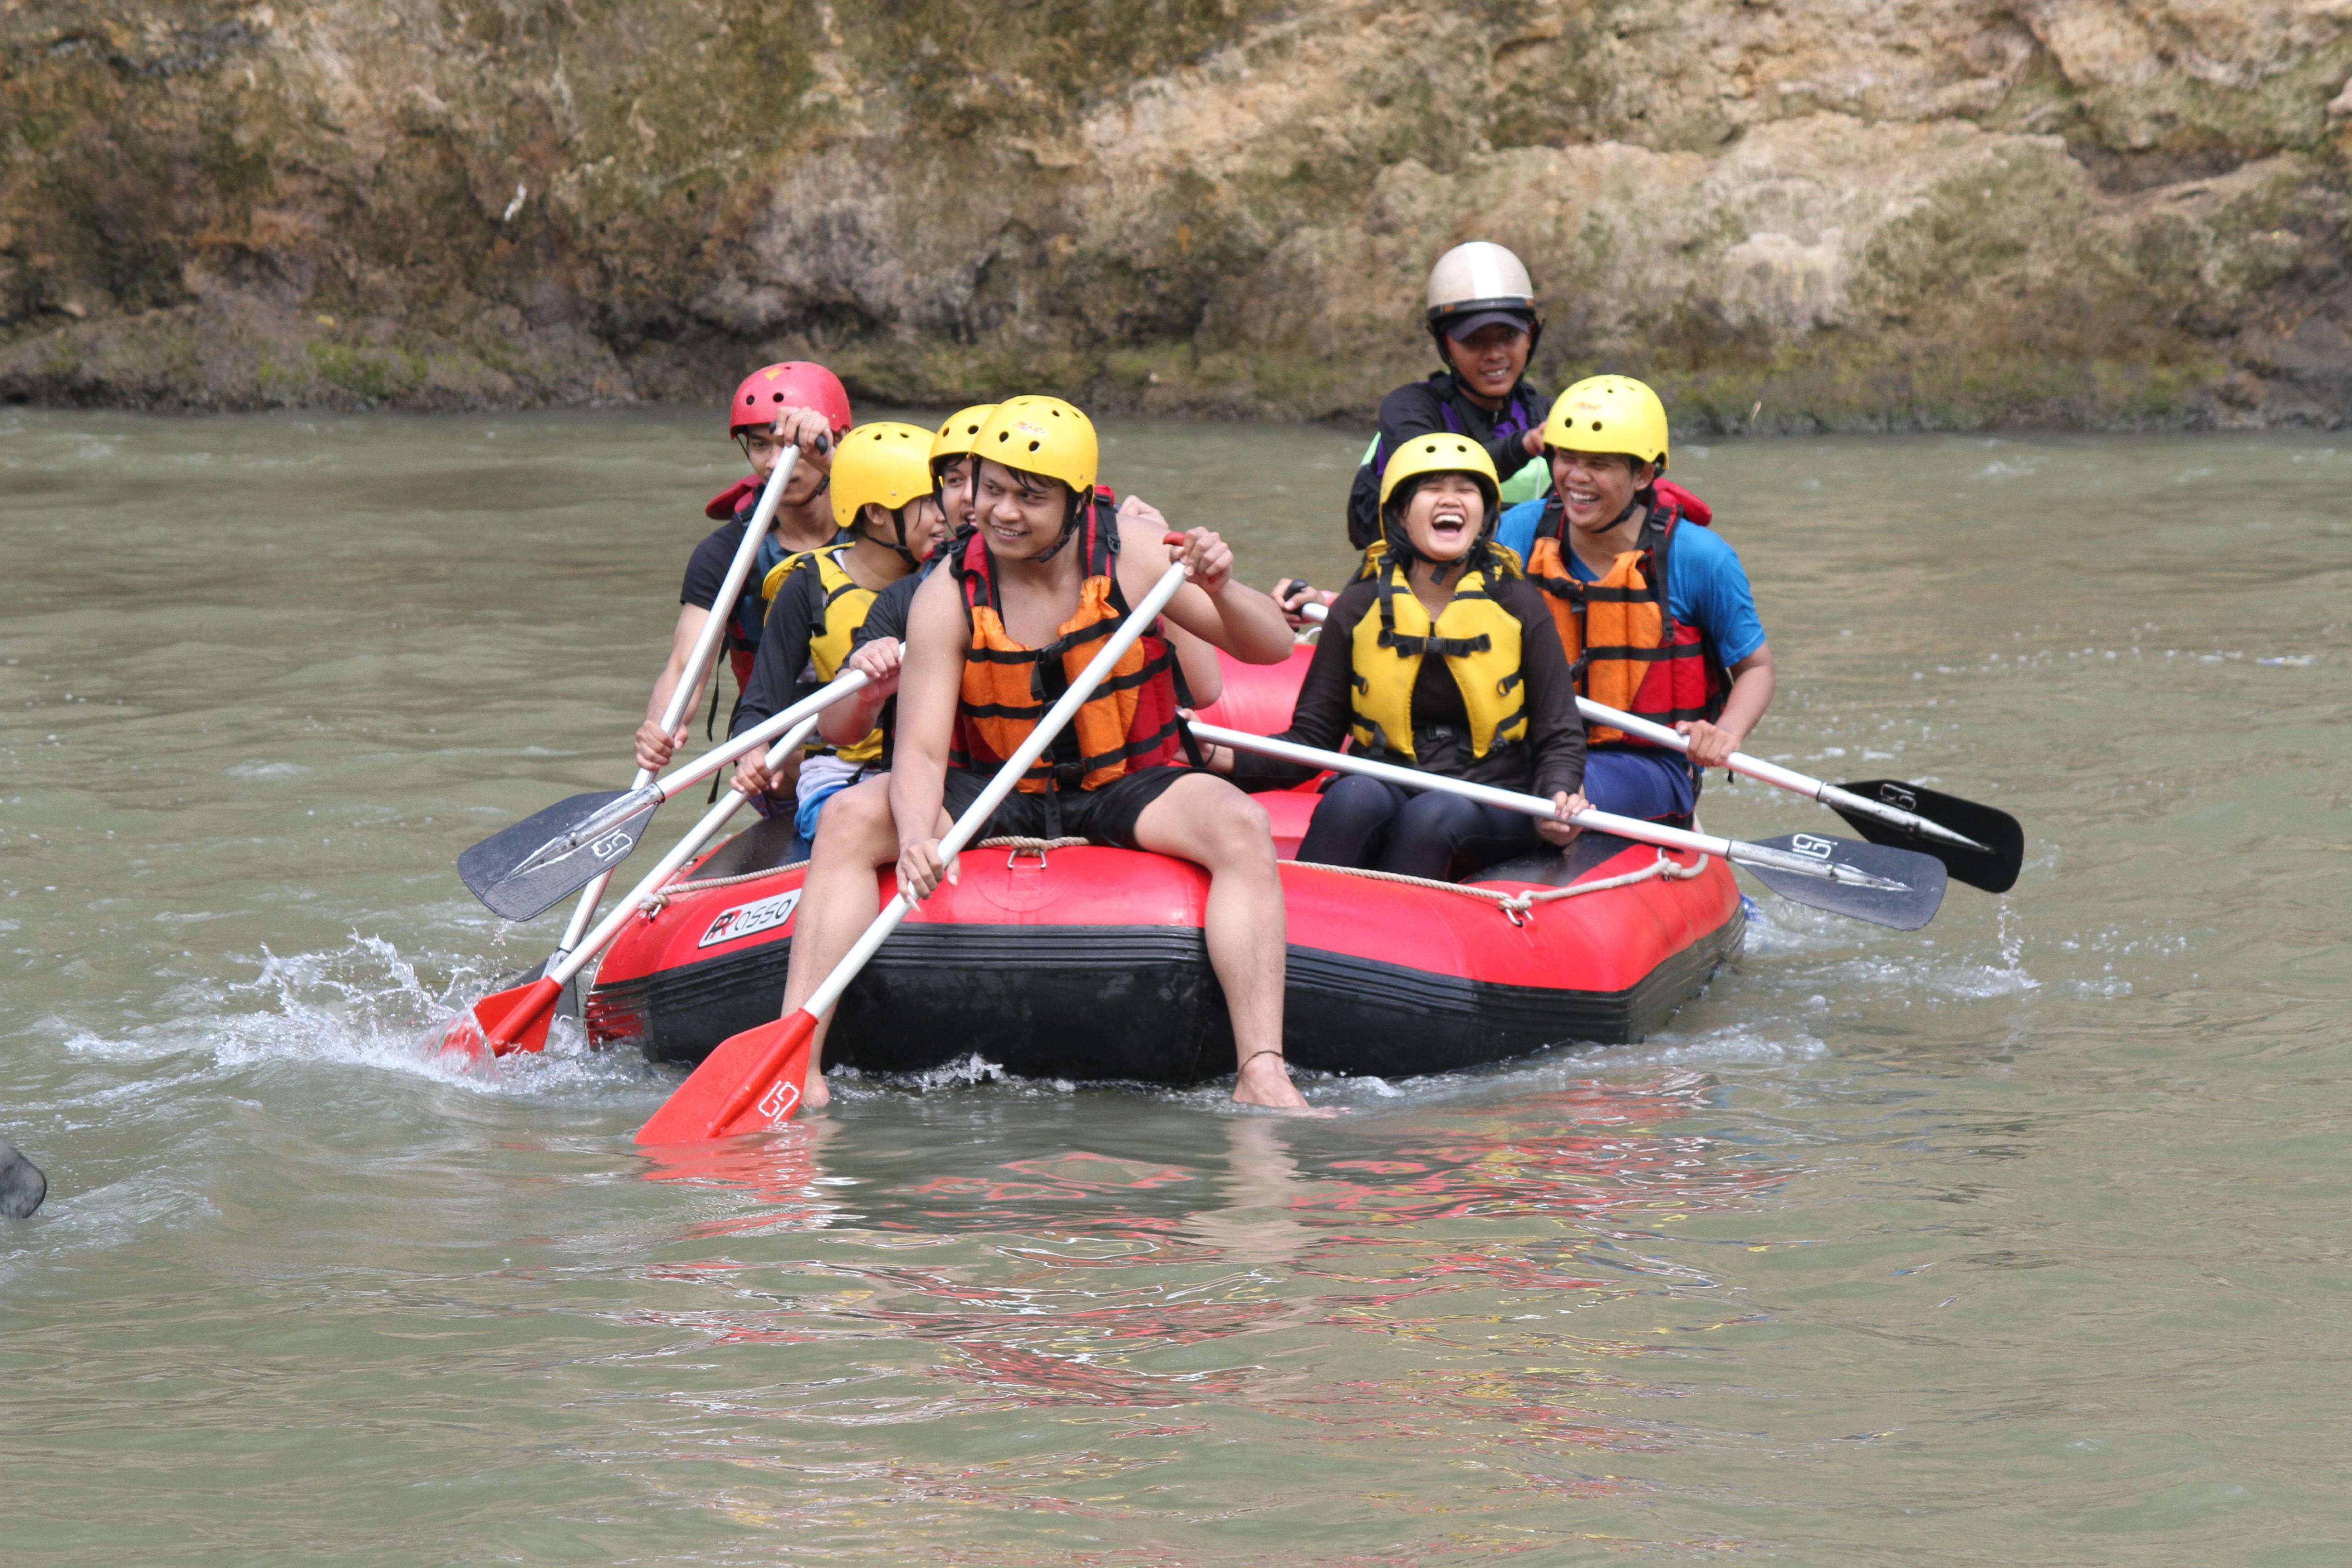 Alamat Rafting Sungai Elo Magelang Murah Img 0197 Ello Kab